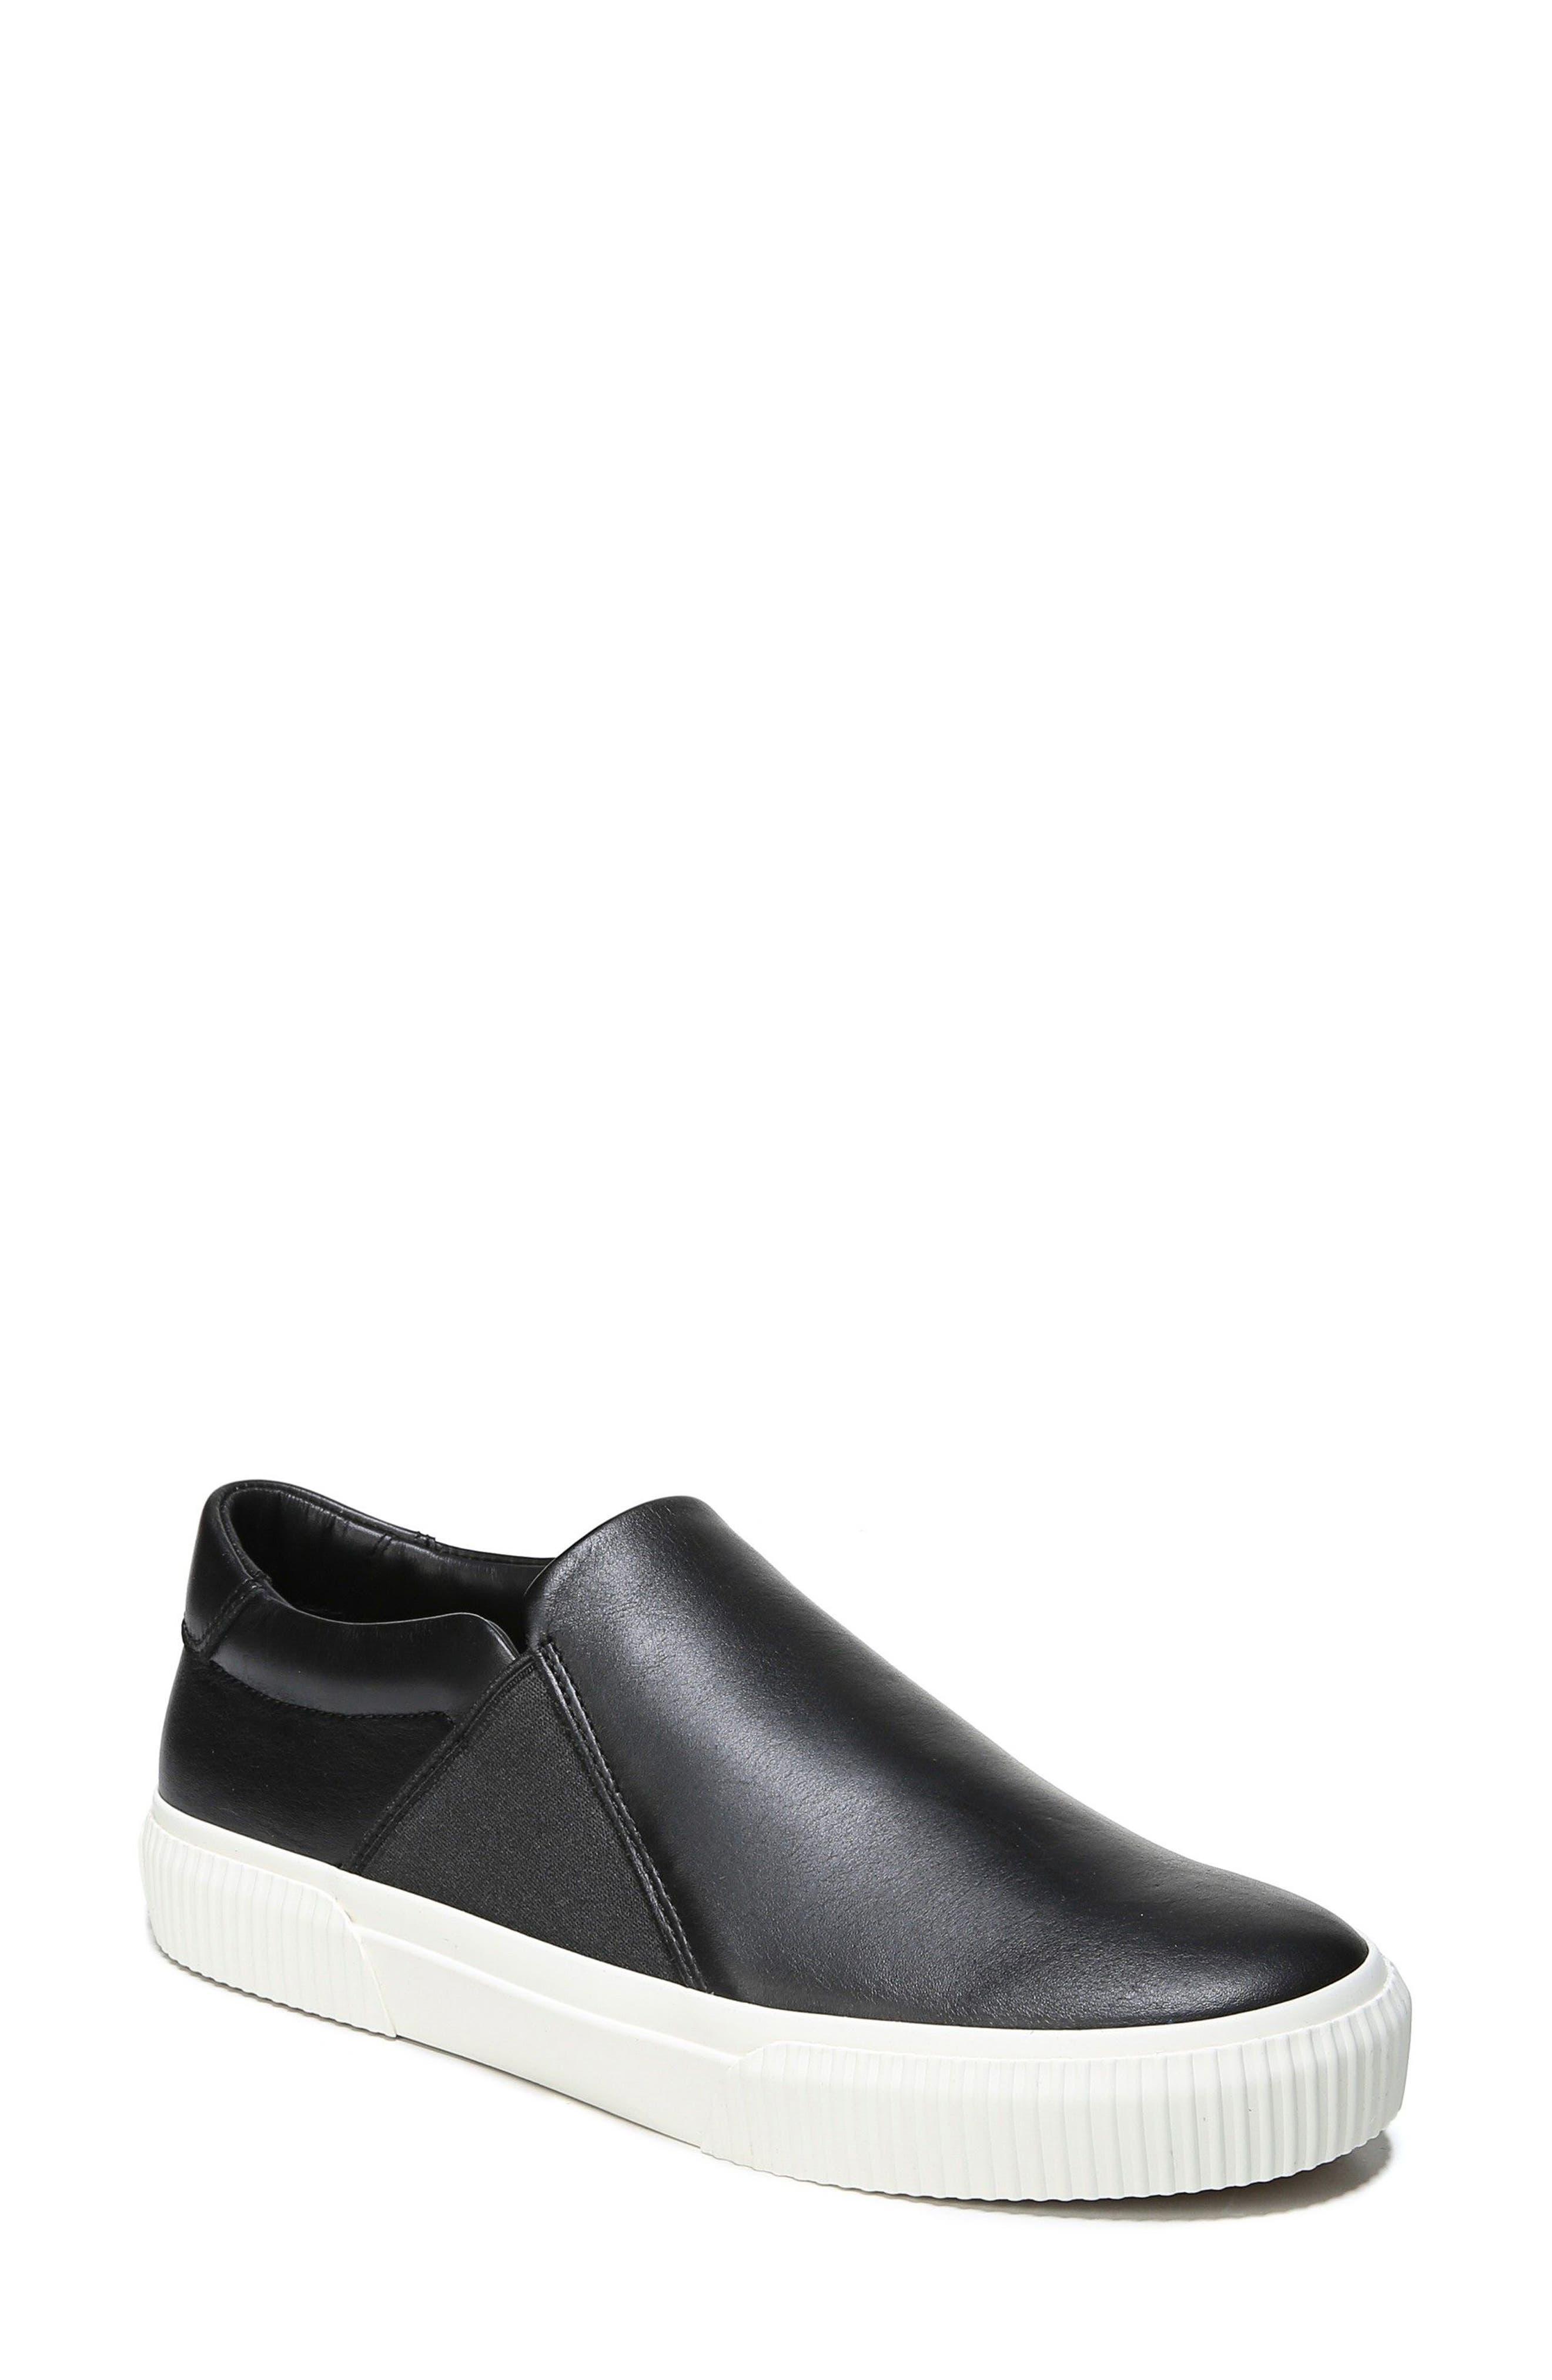 Knox Slip-On Sneaker,                             Main thumbnail 1, color,